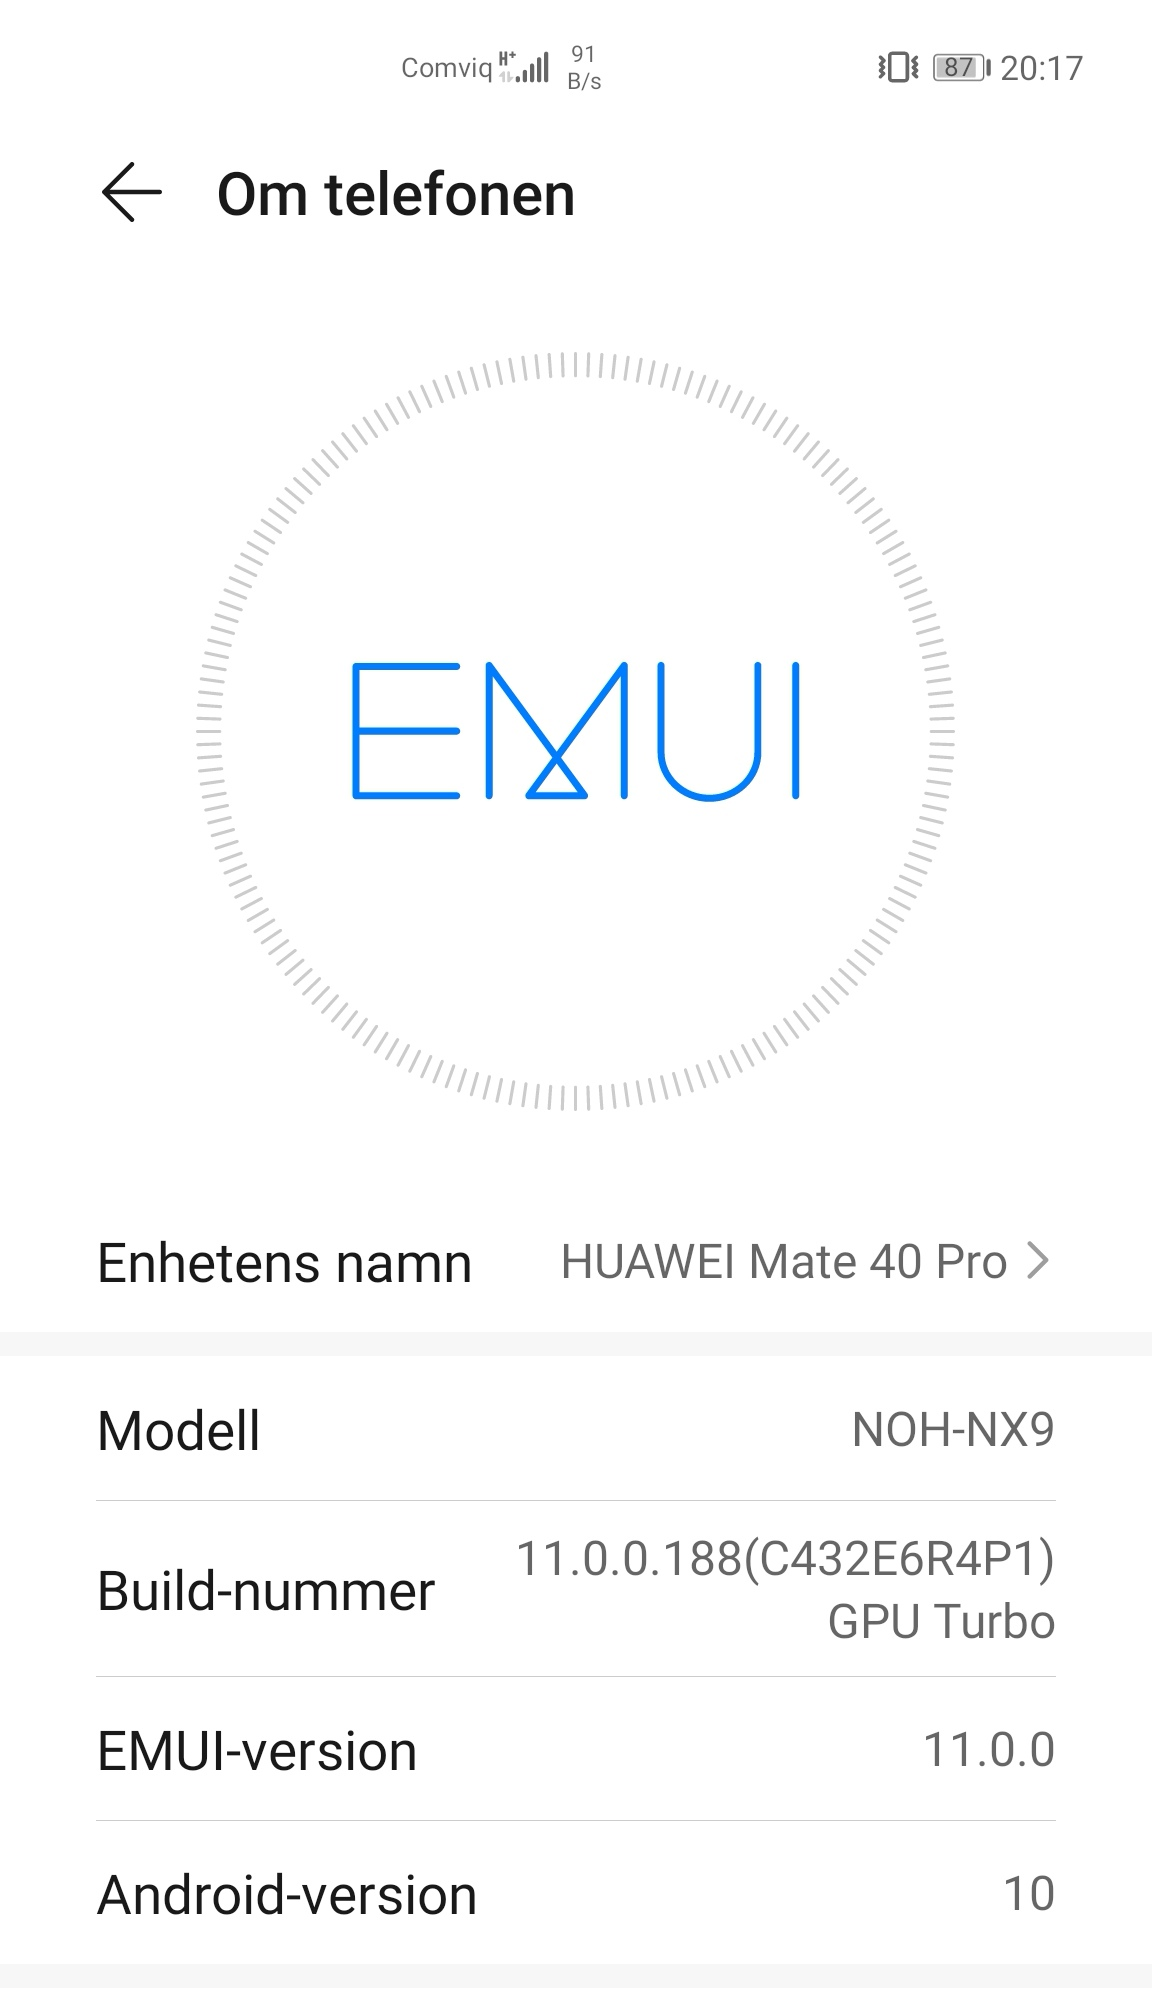 Screenshot_20210716_201751_com.android.settings_edit_14794772076908.jpg